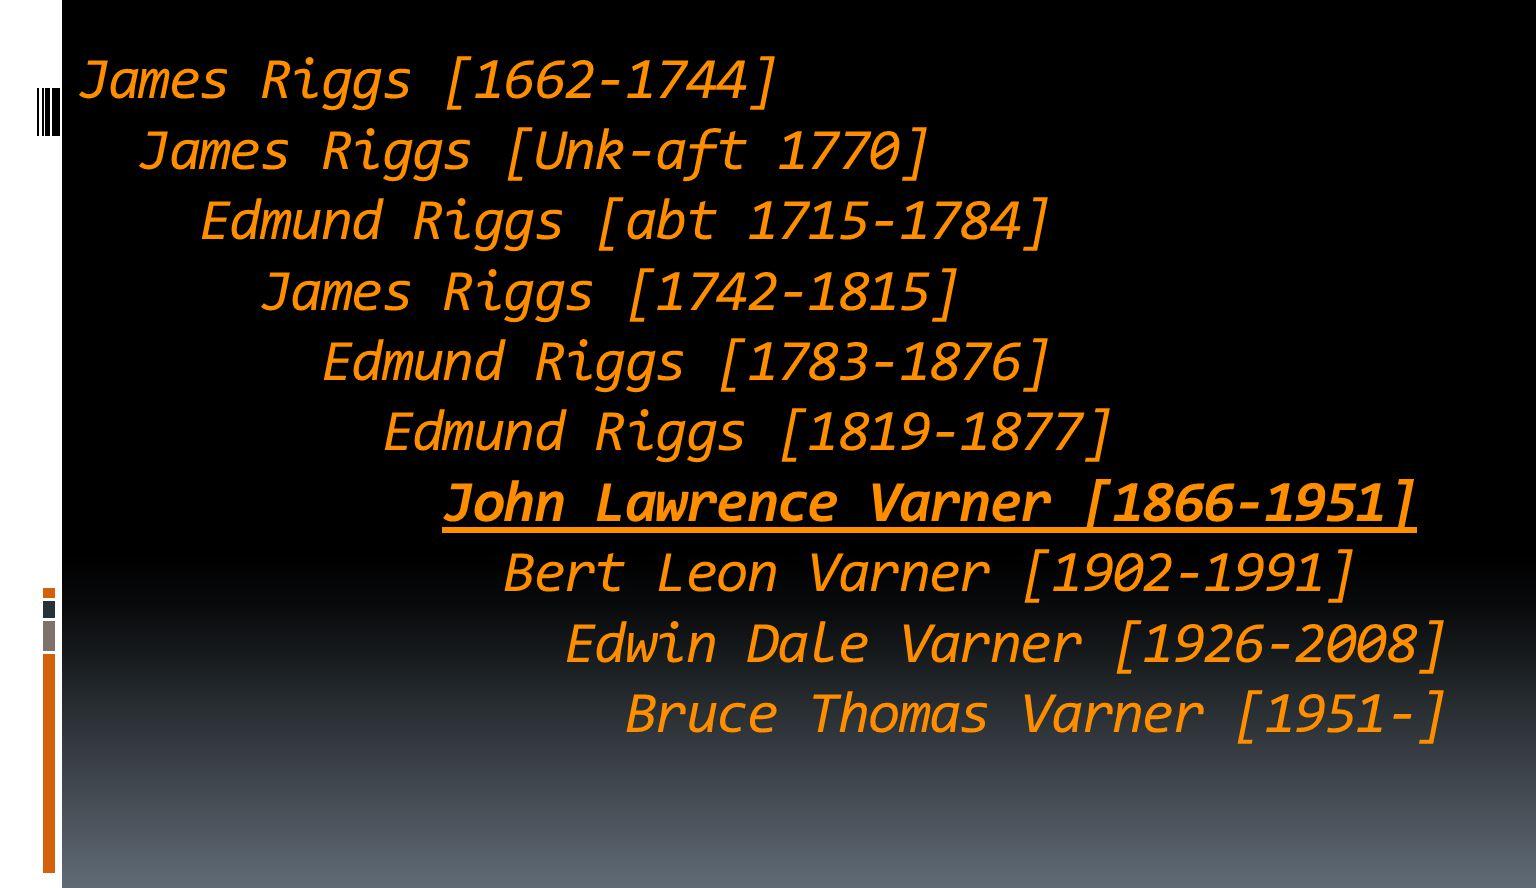 James Riggs [1662-1744] James Riggs [Unk-aft 1770] Edmund Riggs [abt 1715-1784] James Riggs [1742-1815] Edmund Riggs [1783-1876] Edmund Riggs [1819-1877] John Lawrence Varner [1866-1951] Bert Leon Varner [1902-1991] Edwin Dale Varner [1926-2008] Bruce Thomas Varner [1951-]